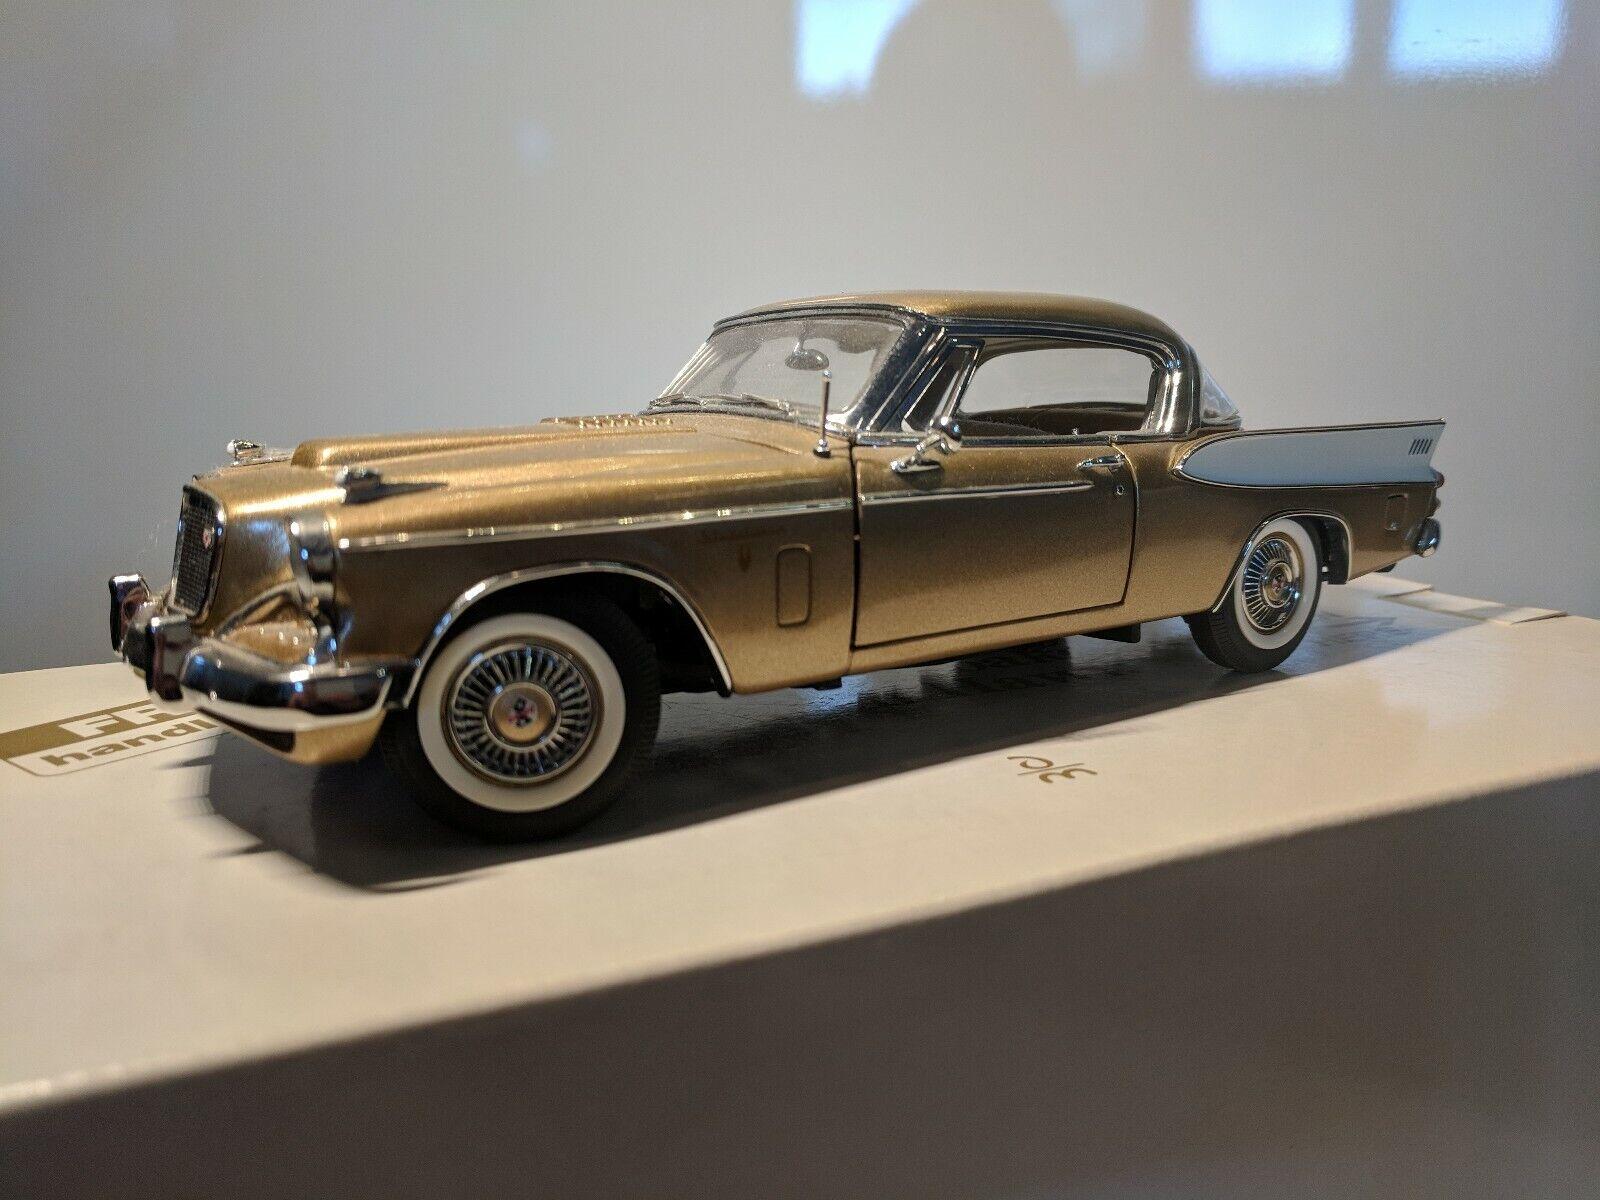 Danbury Comme neuf Studebaker oren Hawk 1957 Diecast voiture Boîte sans papiers